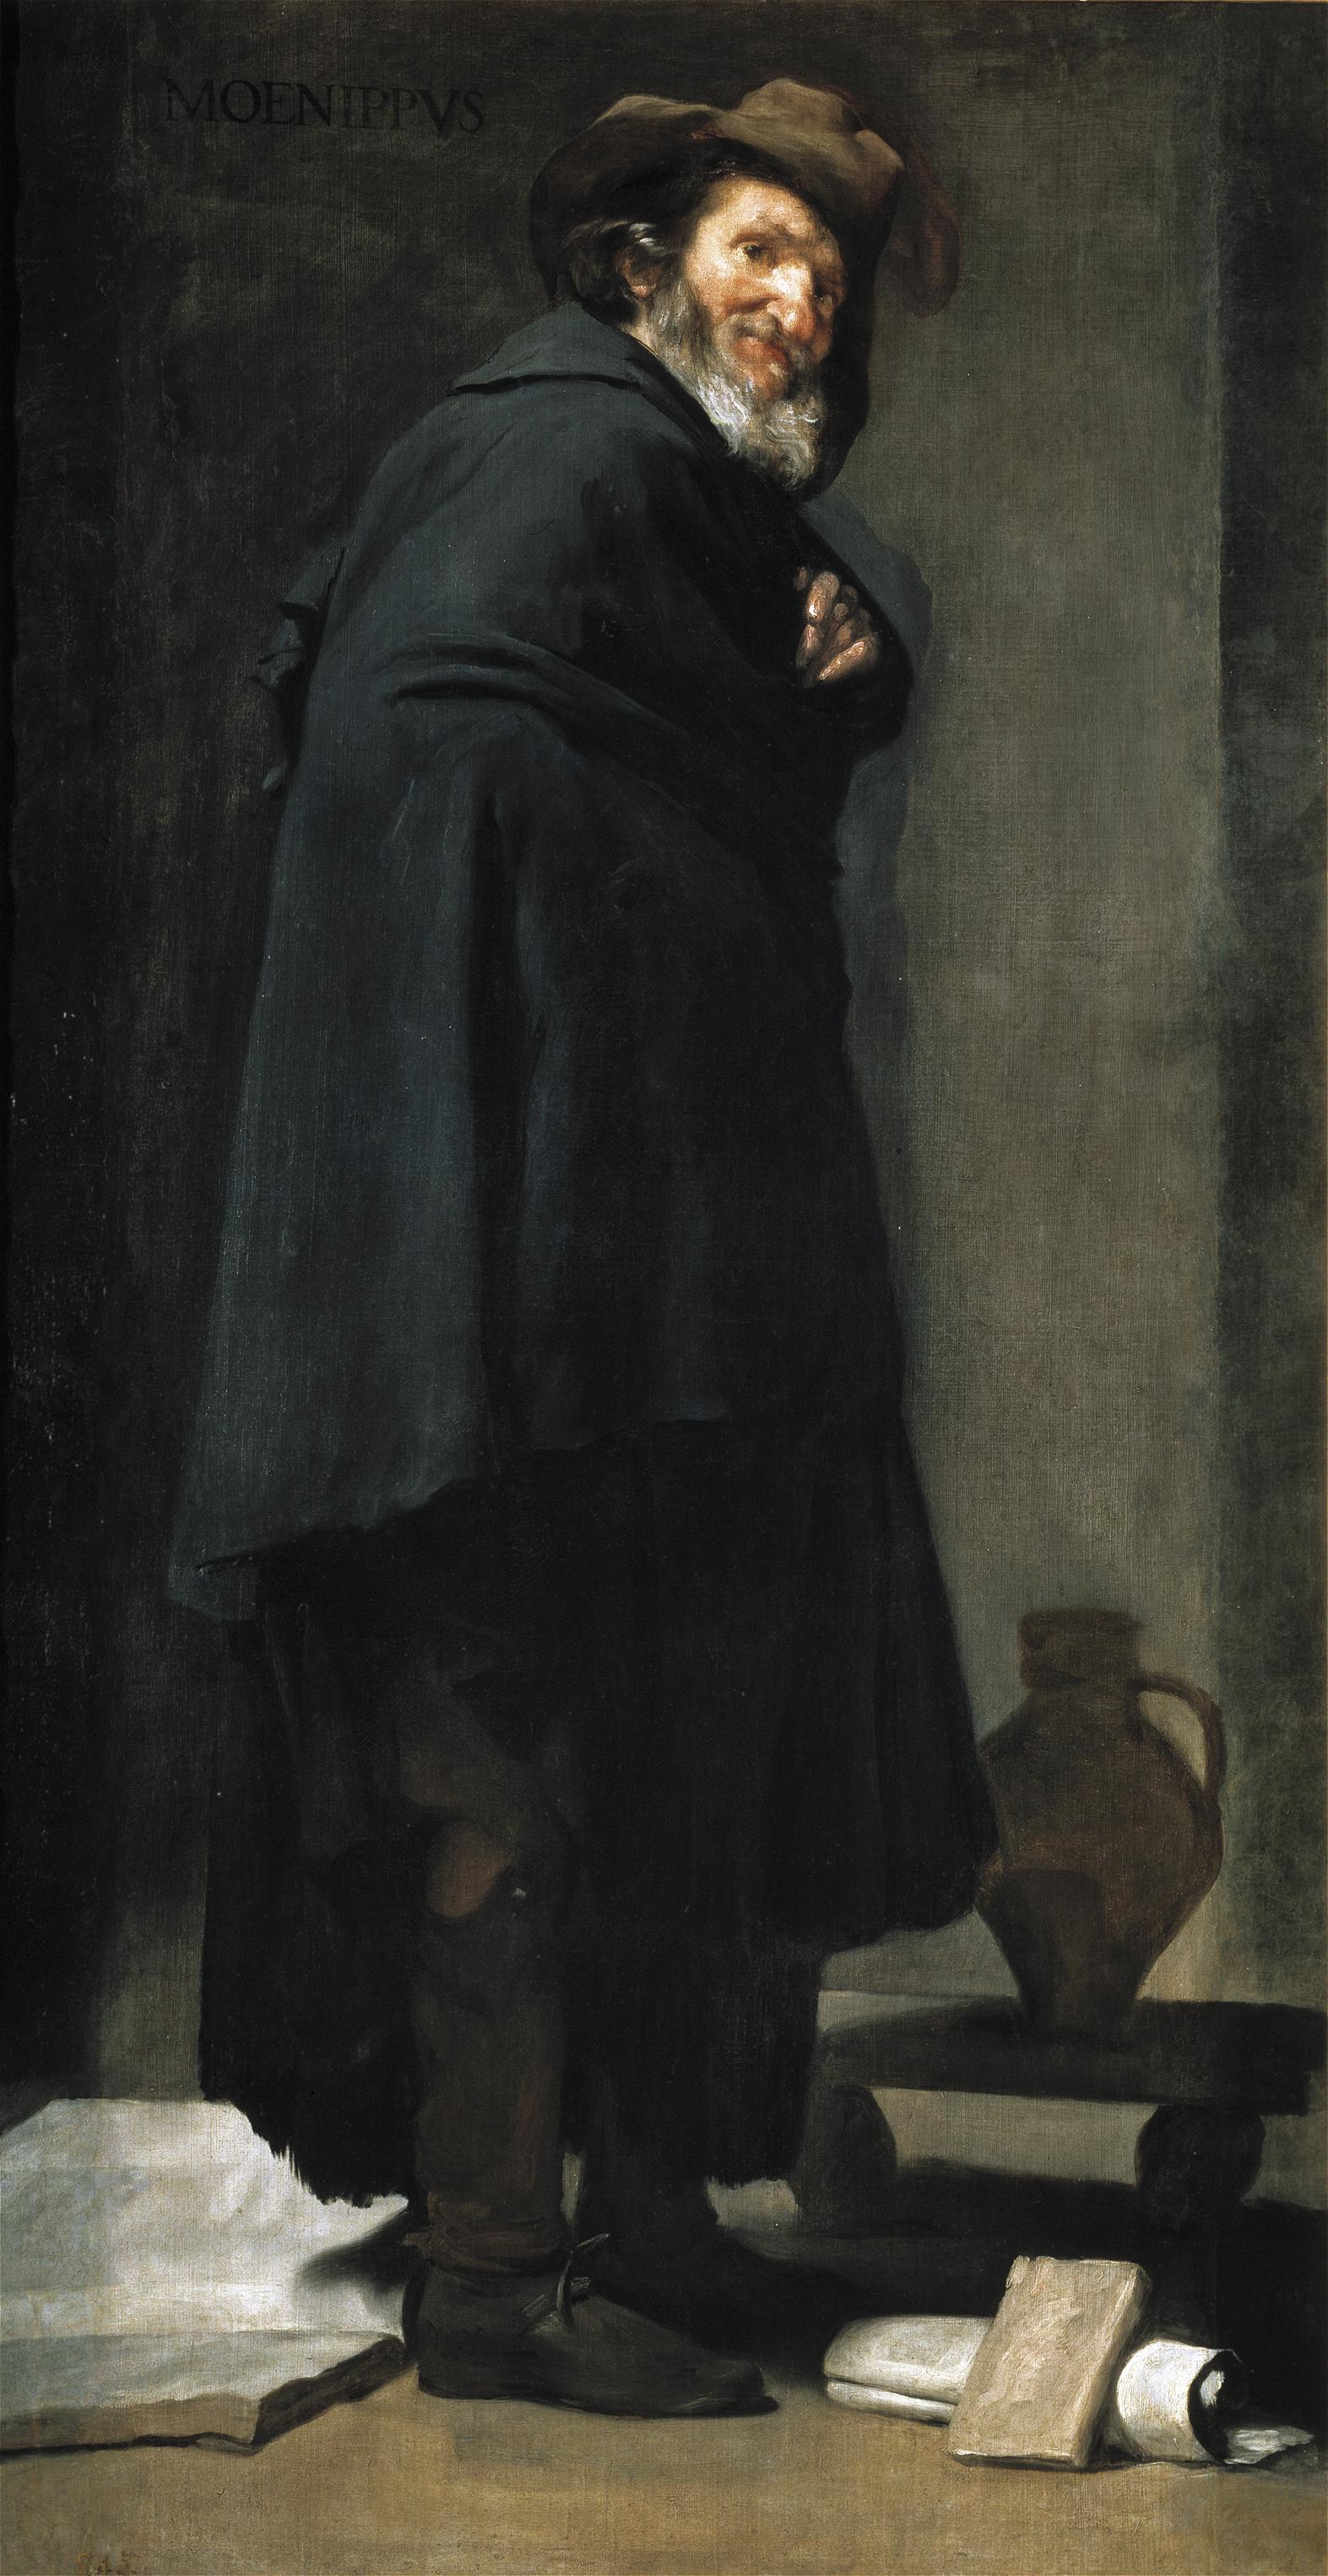 Pinturas de Diego Velázquez   Pintor Barroco